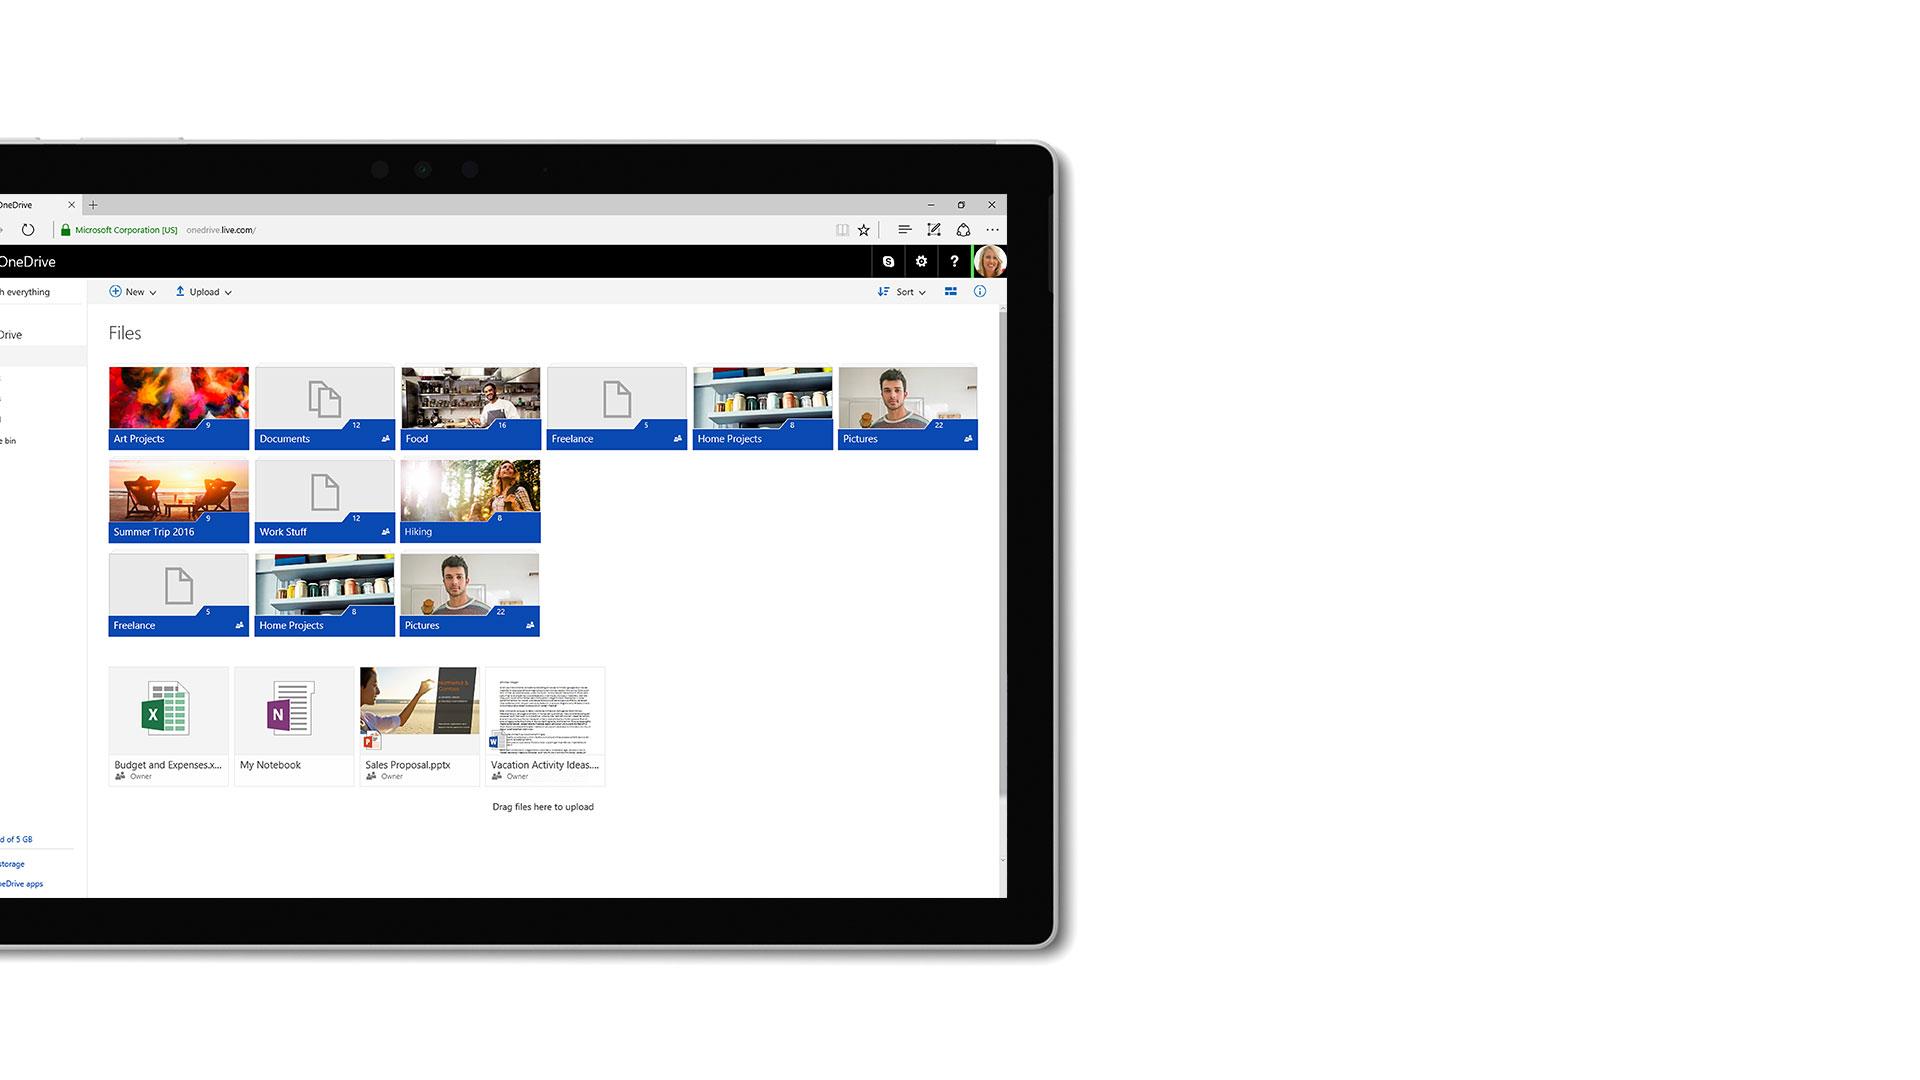 Imej antara muka pengguna Microsoft OneDrive